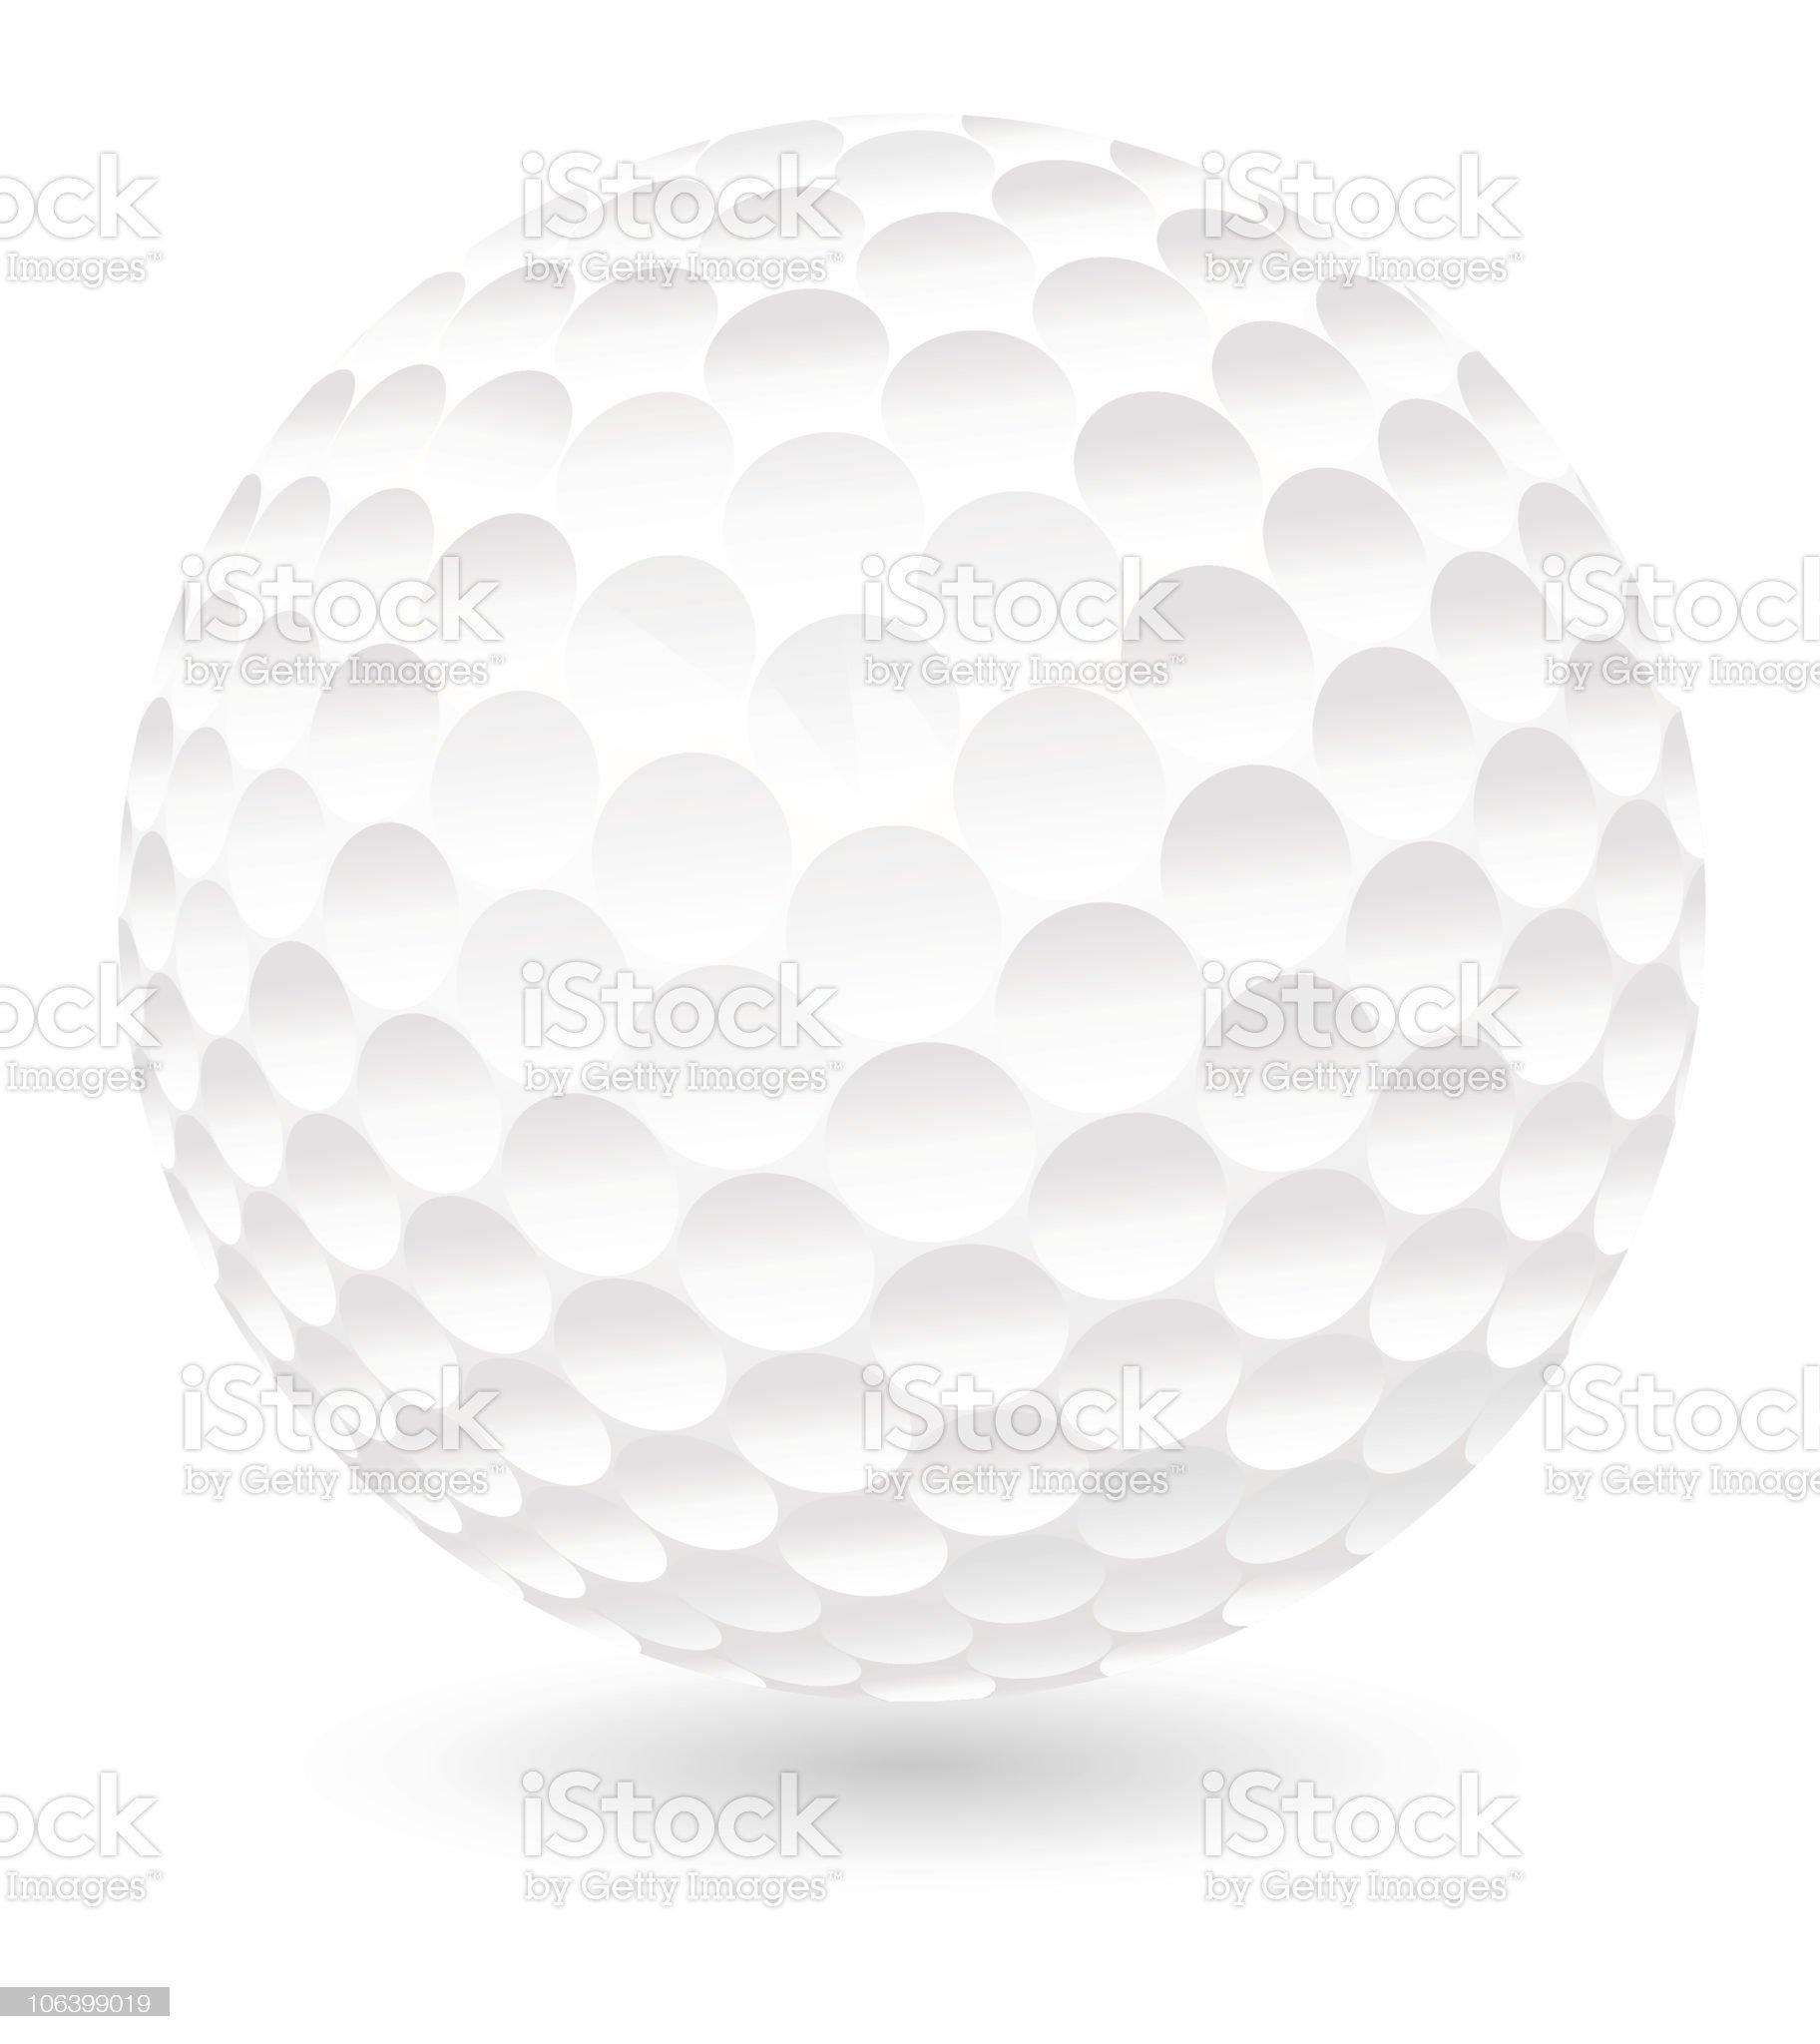 Golf ball royalty-free stock vector art